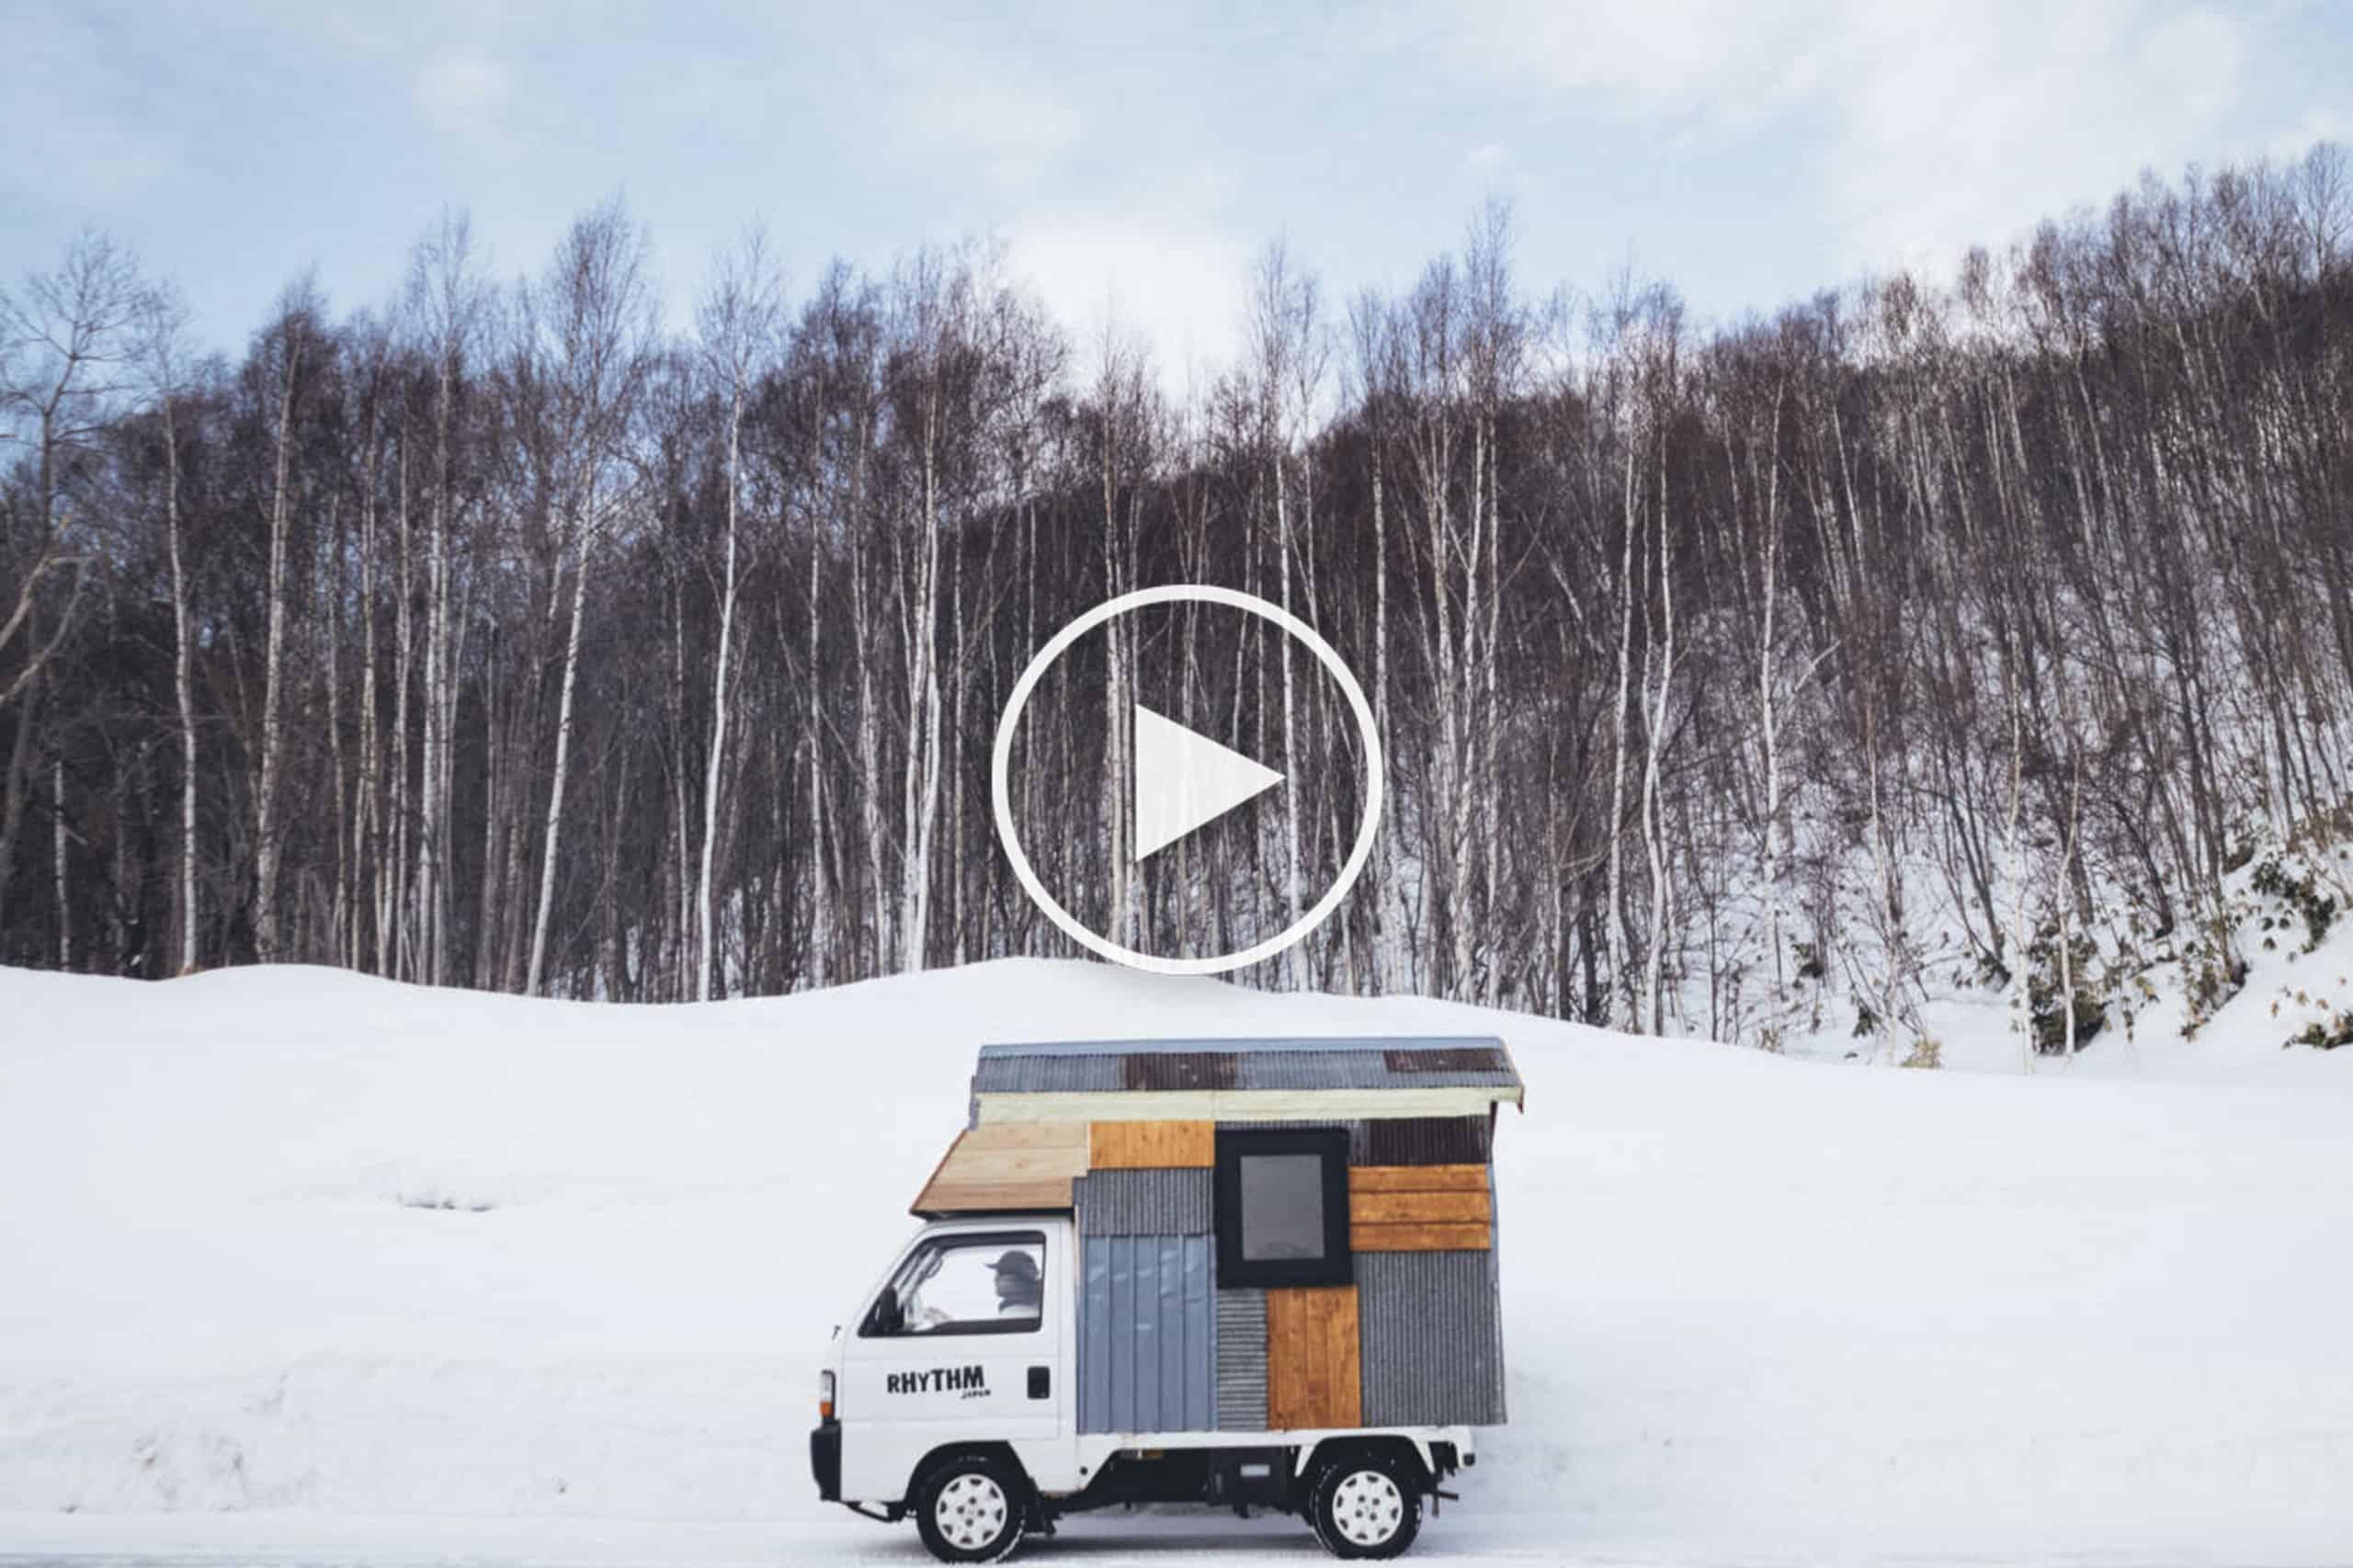 Video - Wasi Sabi, A Snowboarding Odyssey Through Hokkaido's Interior